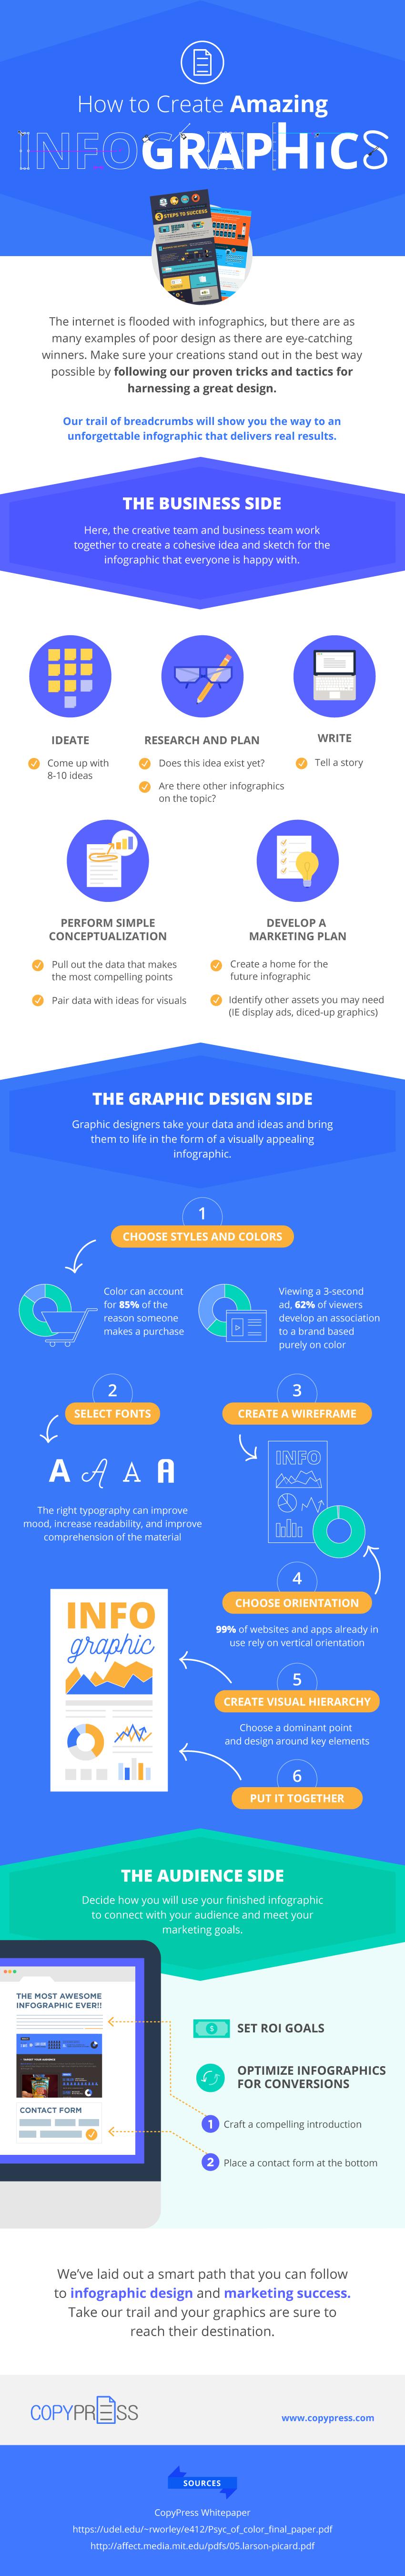 CopyPress - Infographic Blog Post